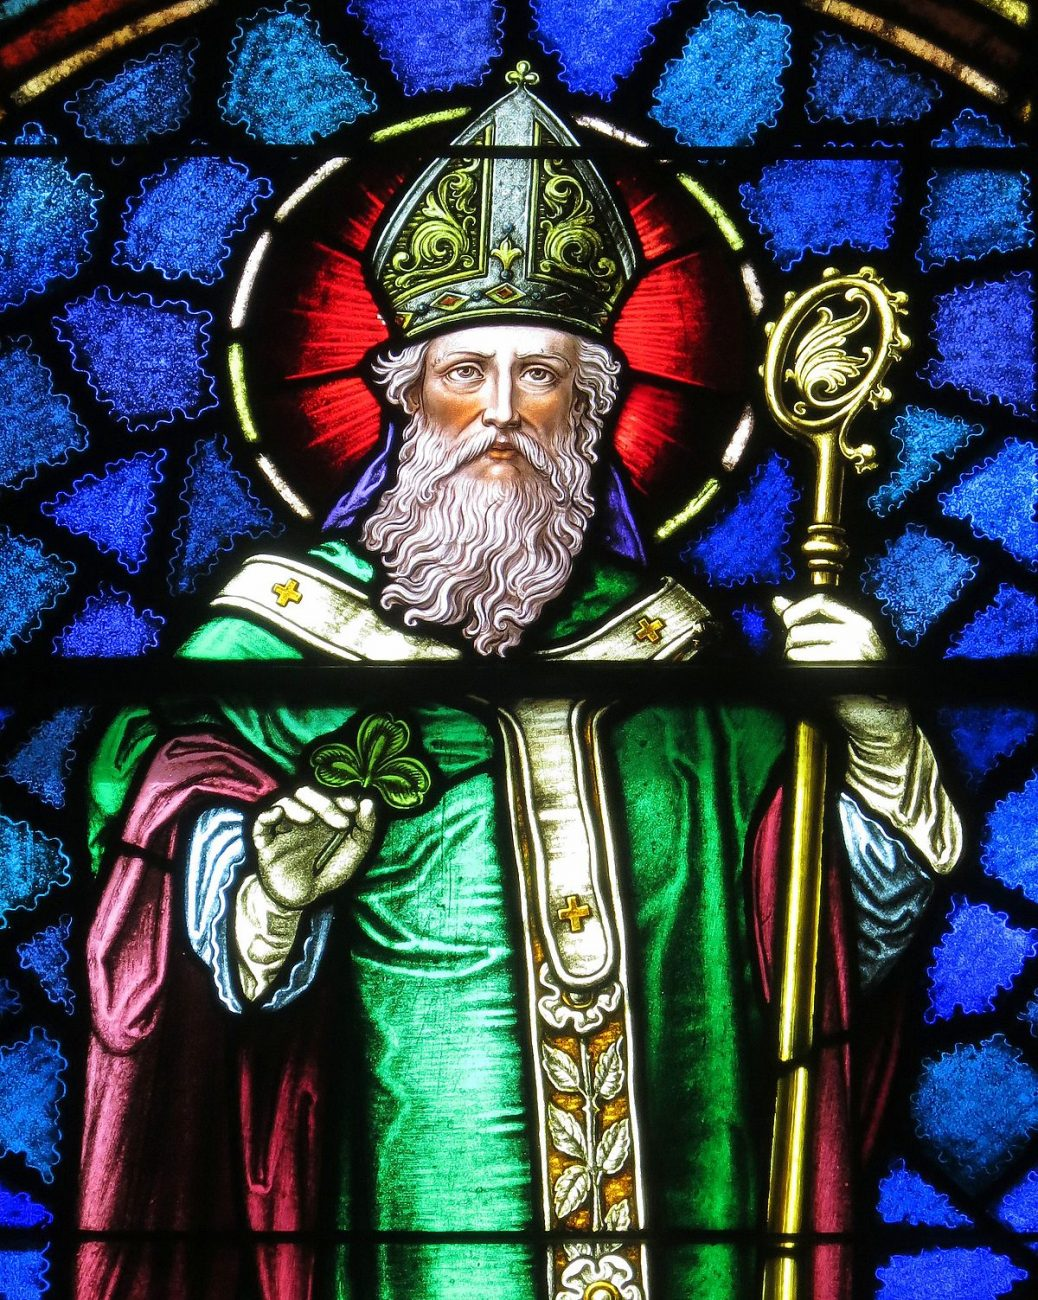 St. Patrick, the Apostle of Ireland